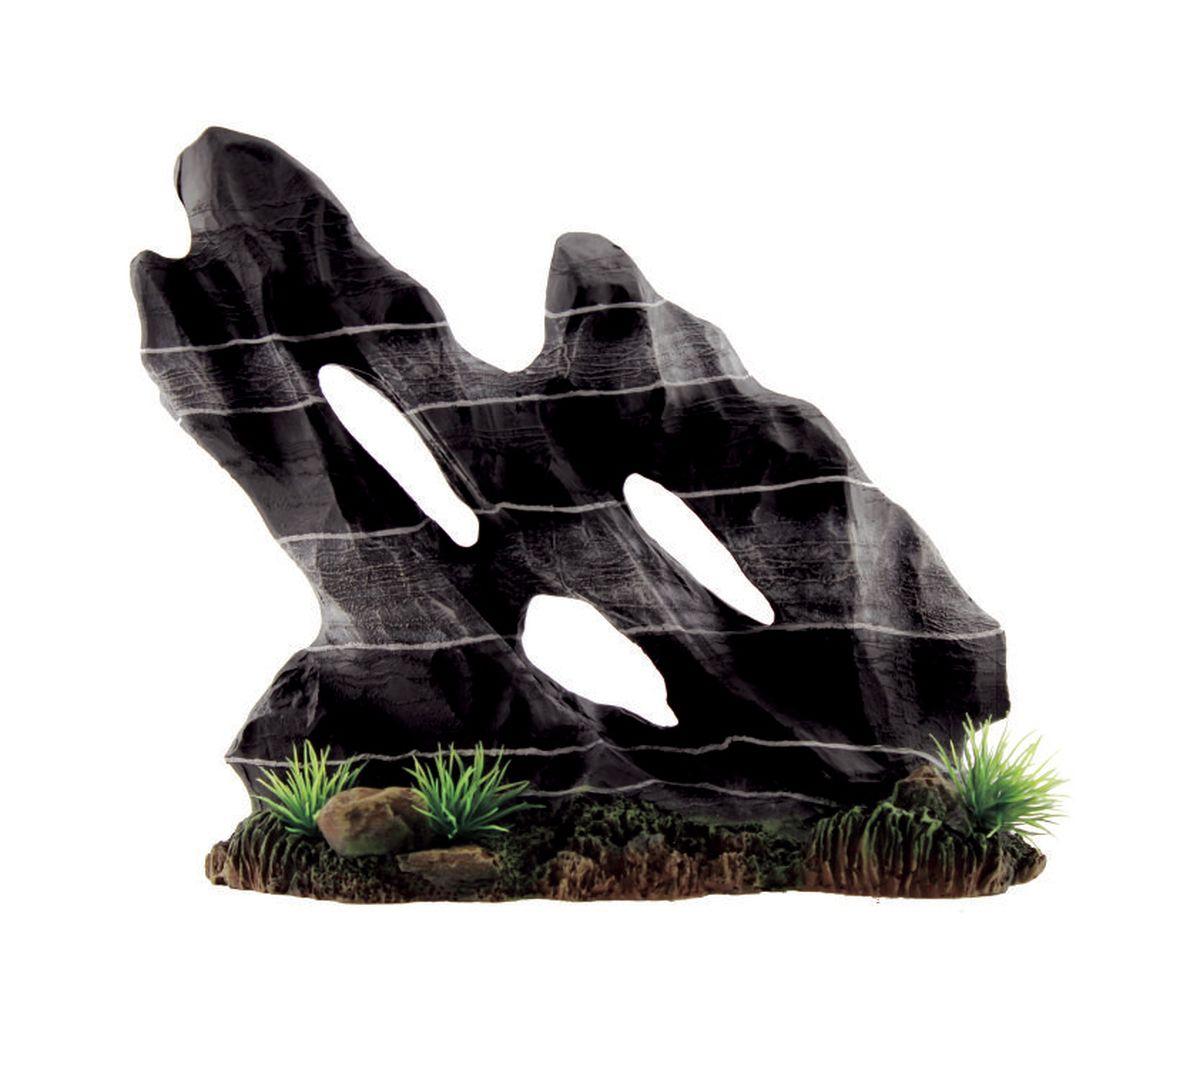 Декорация для аквариума ArtUniq Каменная скульптура, 23 x 8 x 19,5 см декорация для аквариума artuniq пористый камень 20 5 x 10 5 x 18 8 см